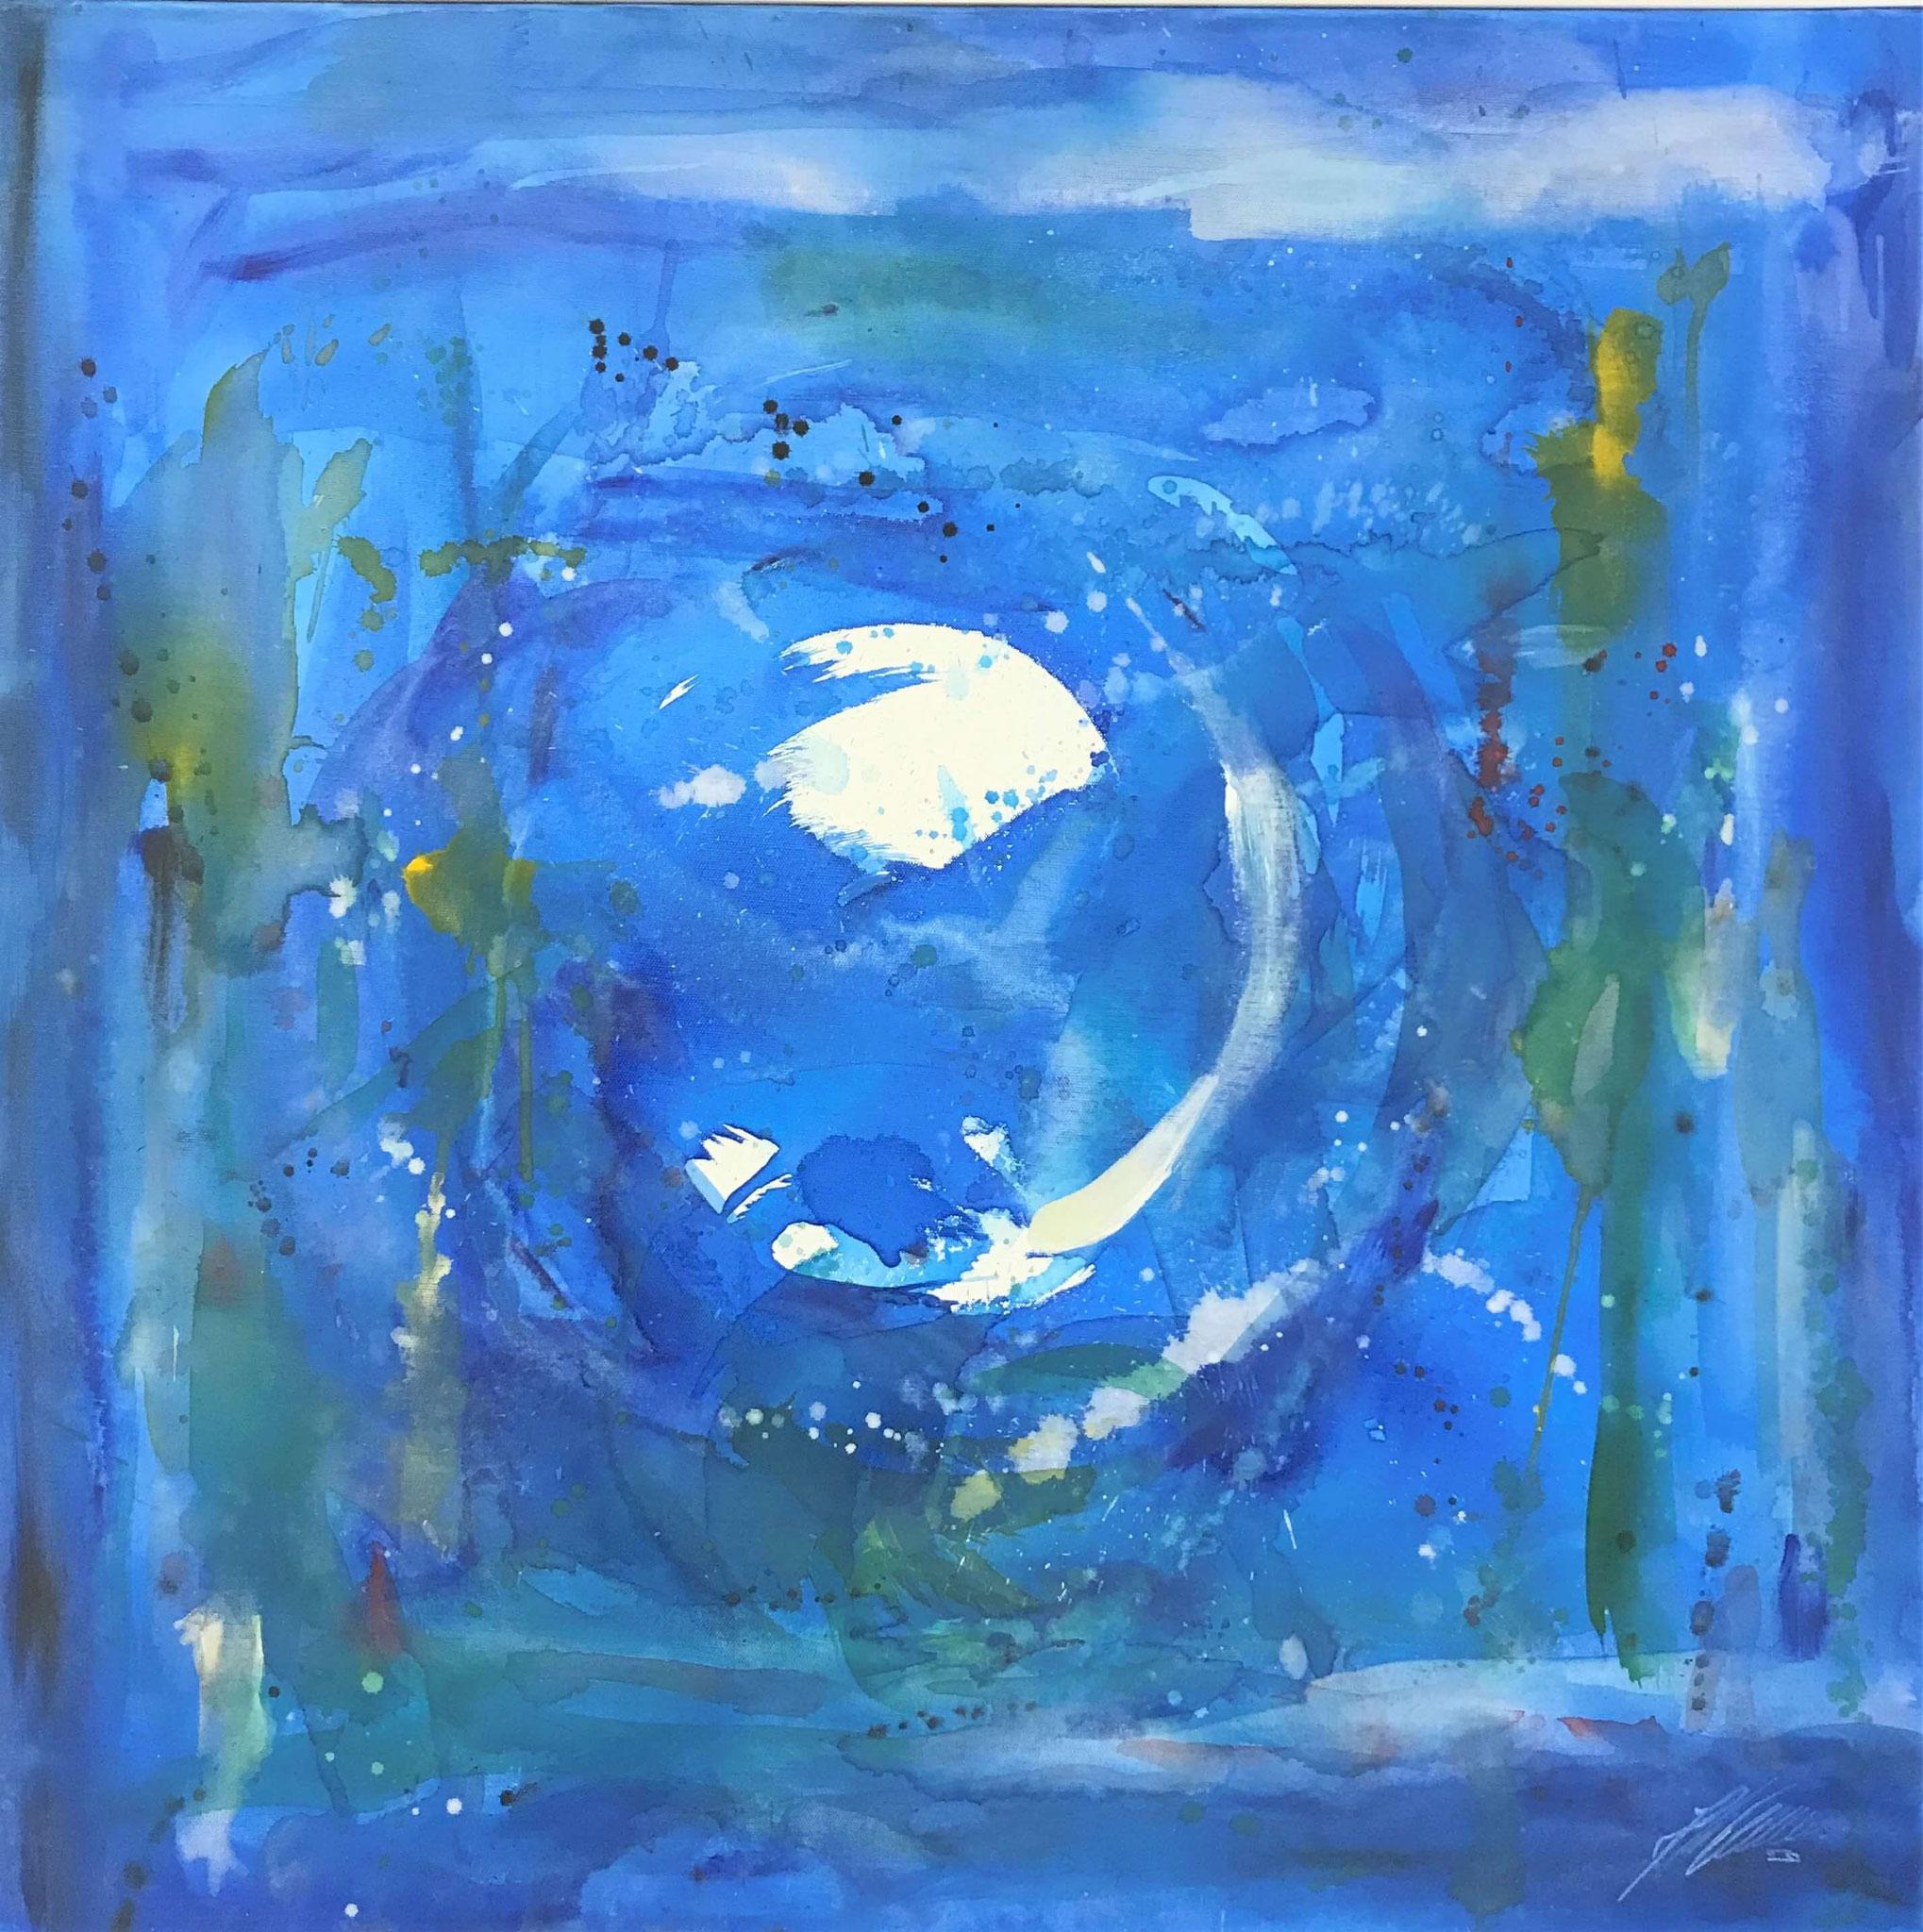 "Fr. 560.00 ""Krebs, Serie abstract"" Acryl auf Leinwand mit Rahmen 80 x 80 cm."